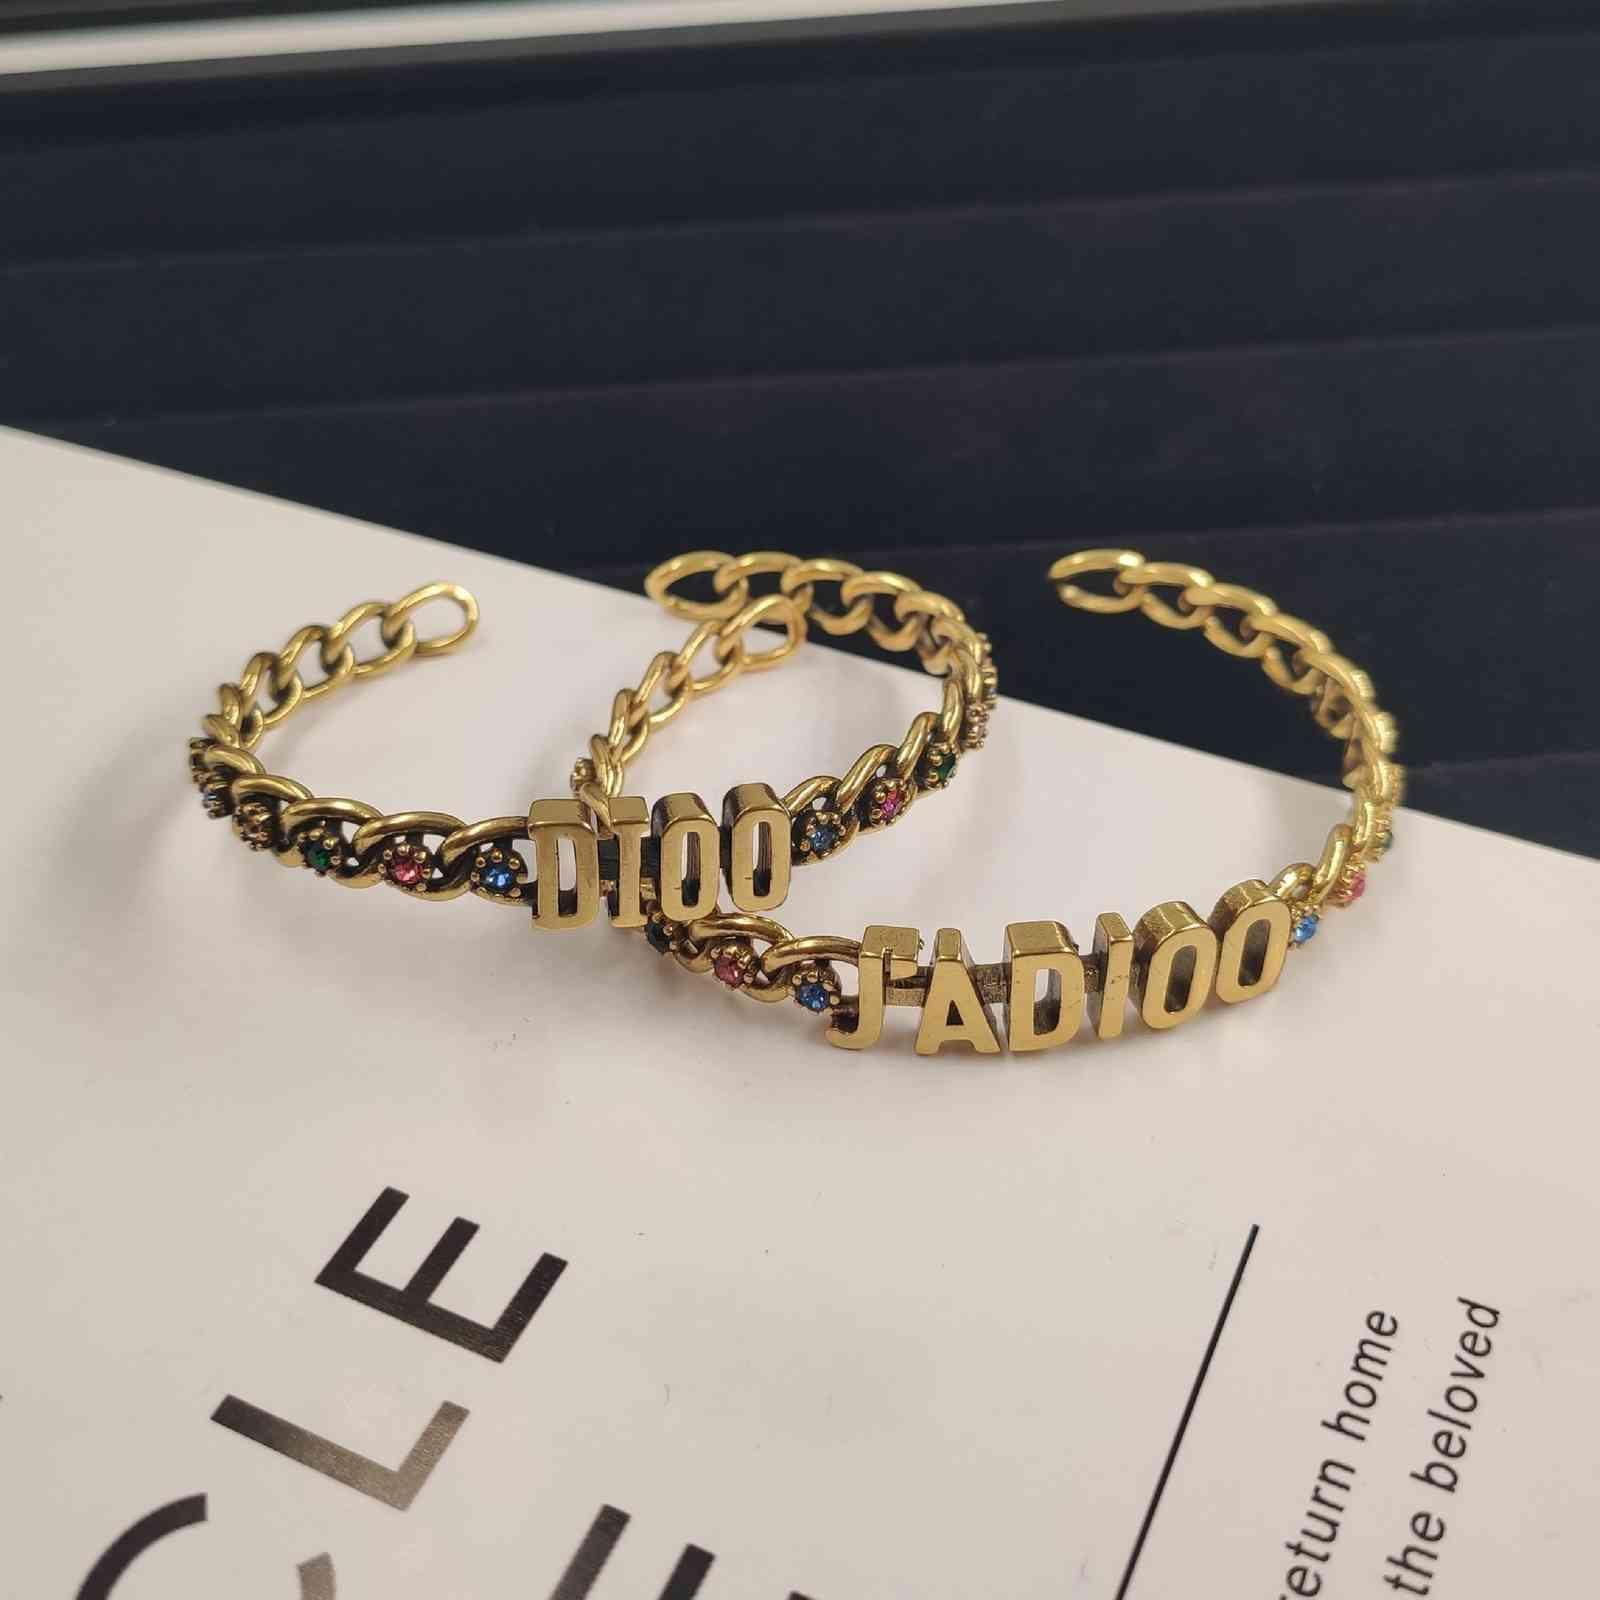 2021 xiaoxiangfeng exquisito diamante versátil personalidad exageración xiangjia dijia xianggranny pulsera d